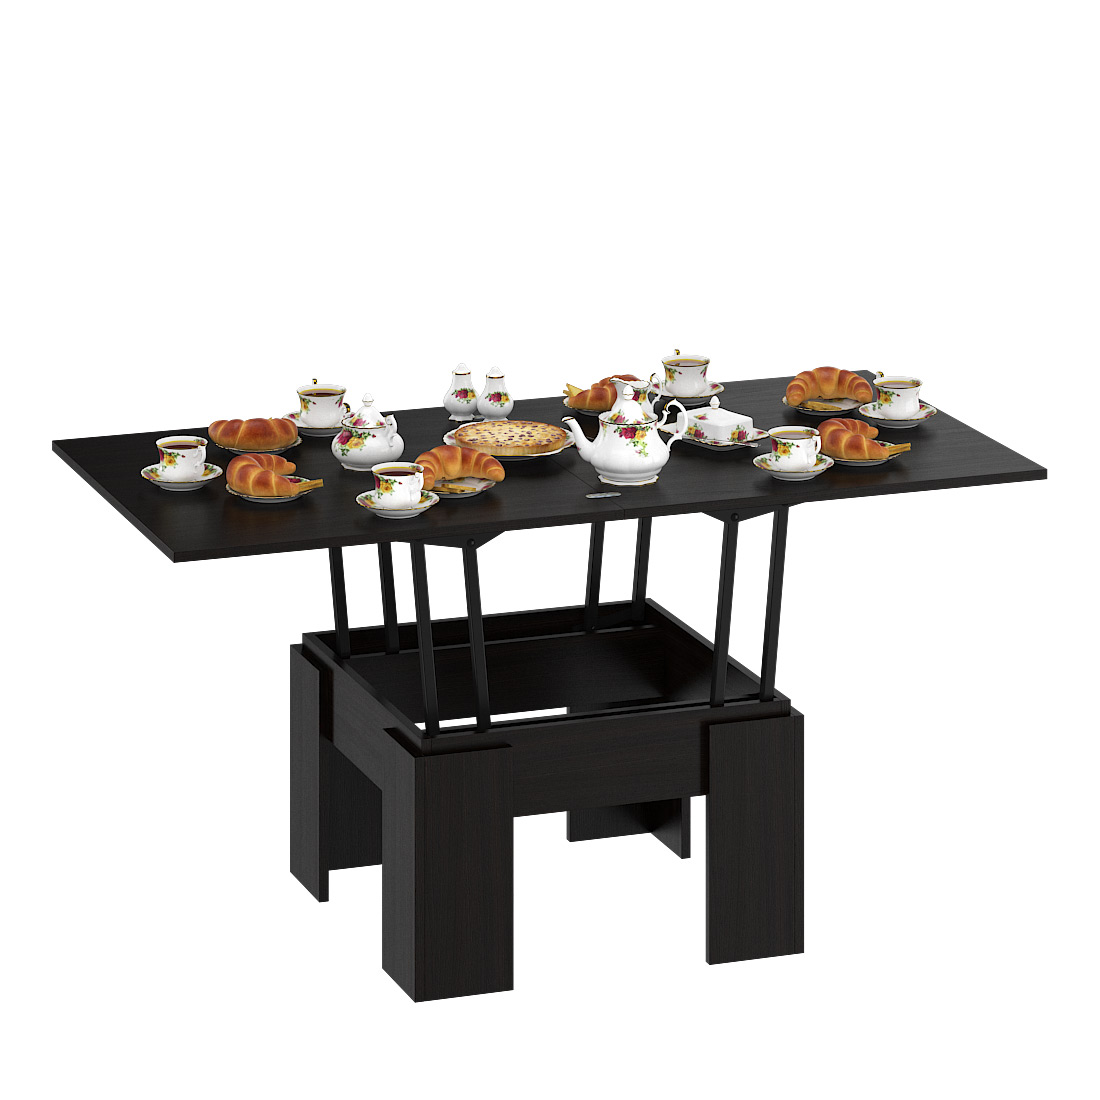 Журнальный столик Delice Бета 1668001 80(160)х80х47,5(81,5)